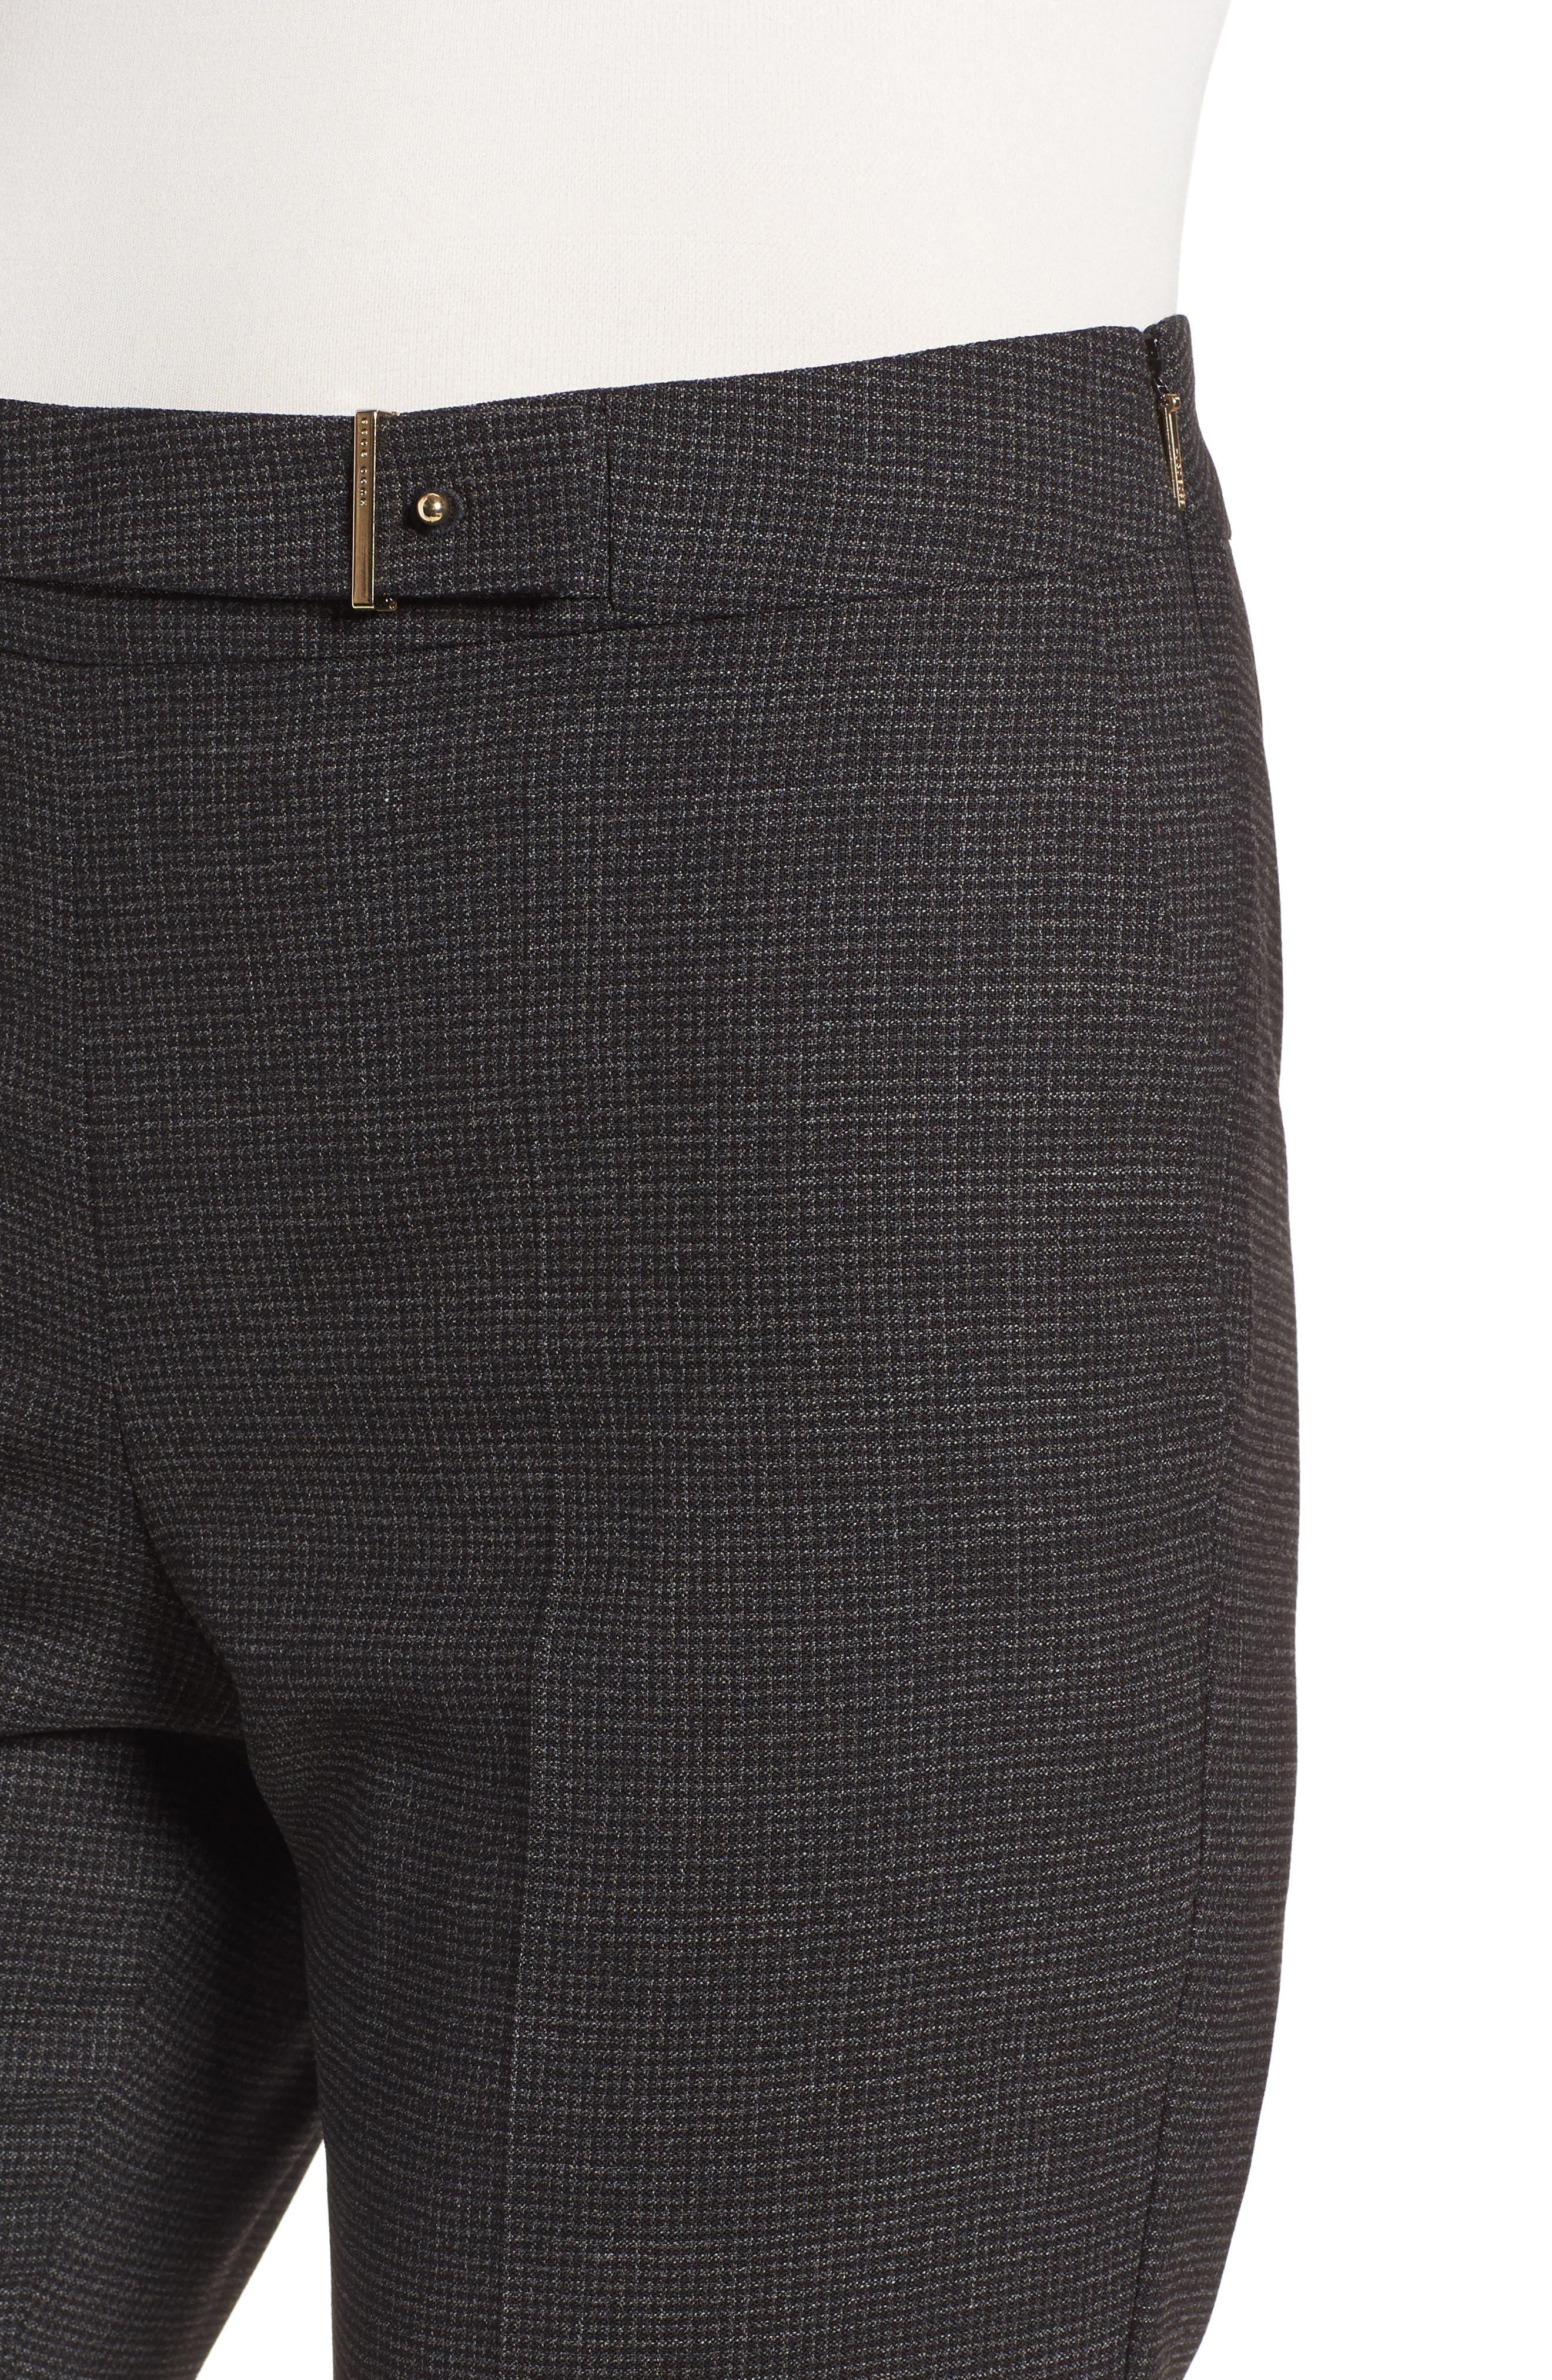 Tafena Check Stretch Wool Pants,                             Alternate thumbnail 4, color,                             006